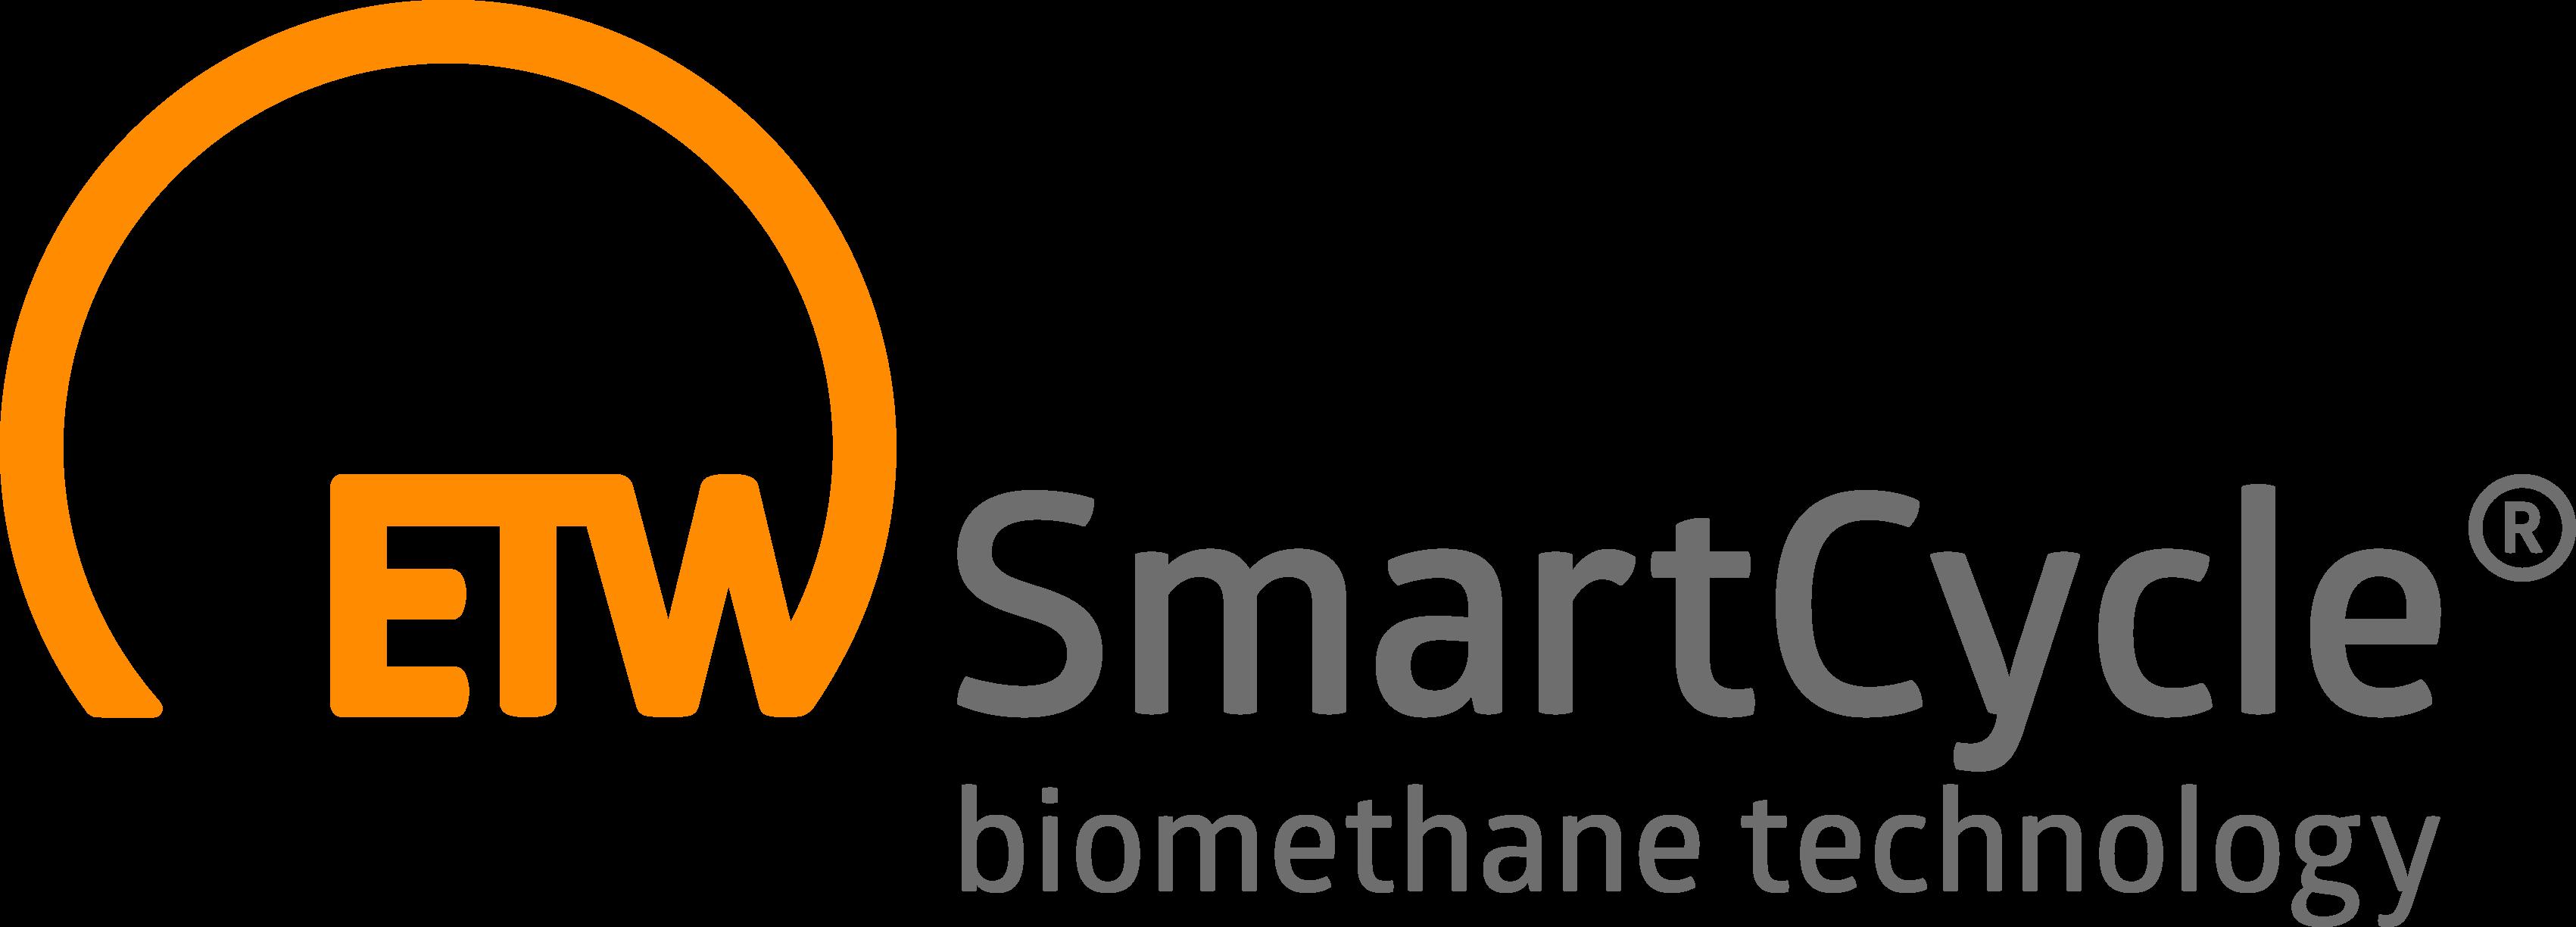 etw-smartcycle-logo-rgb-418